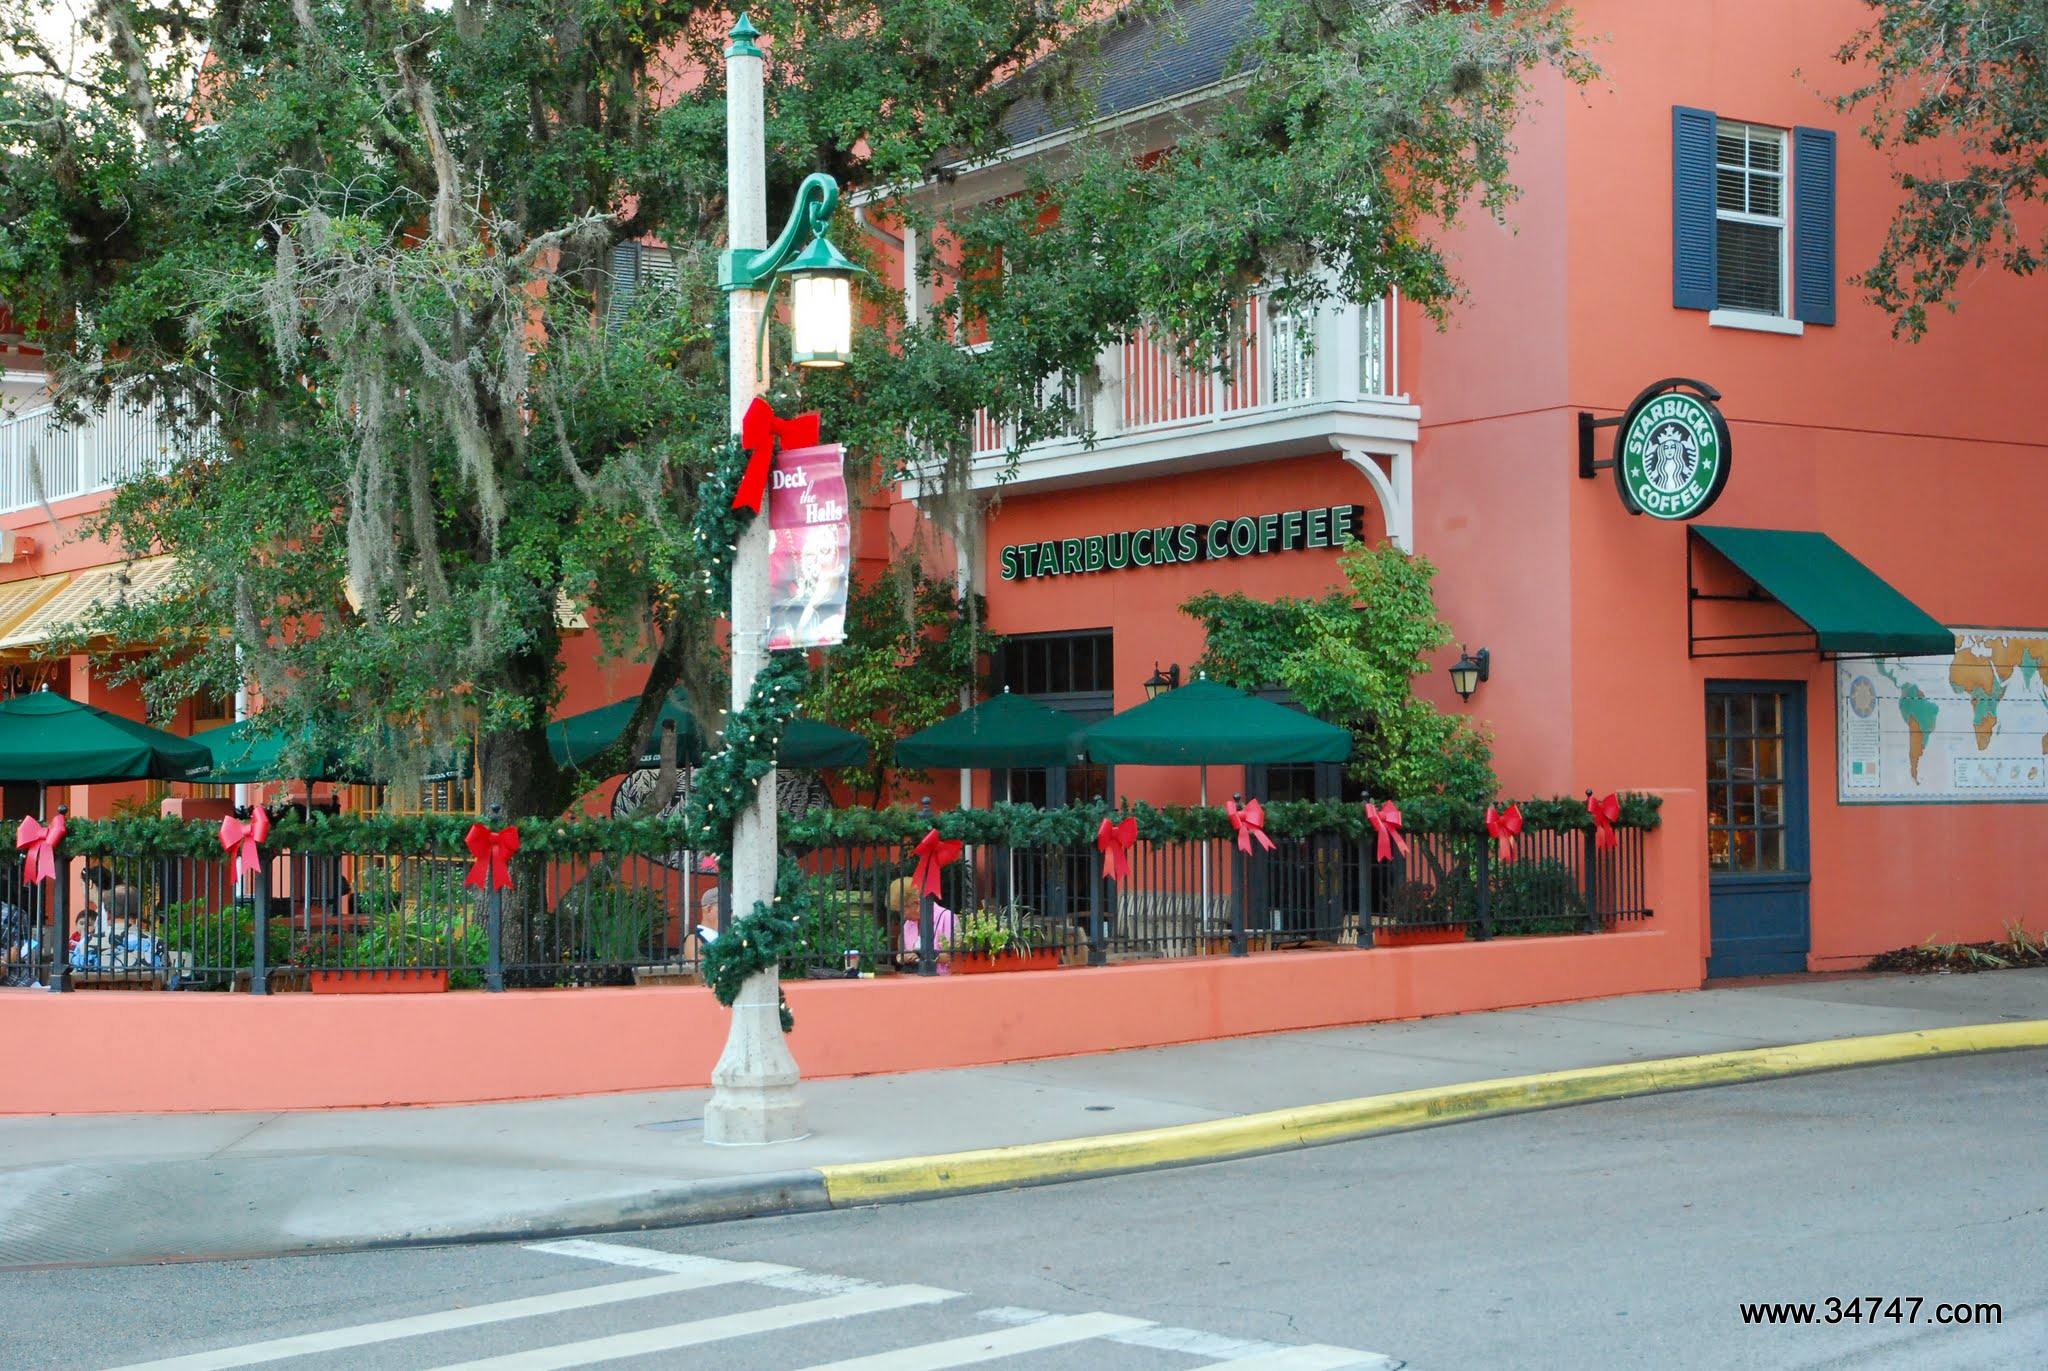 Photo: Starbucks, Town Center, Celebration, FL